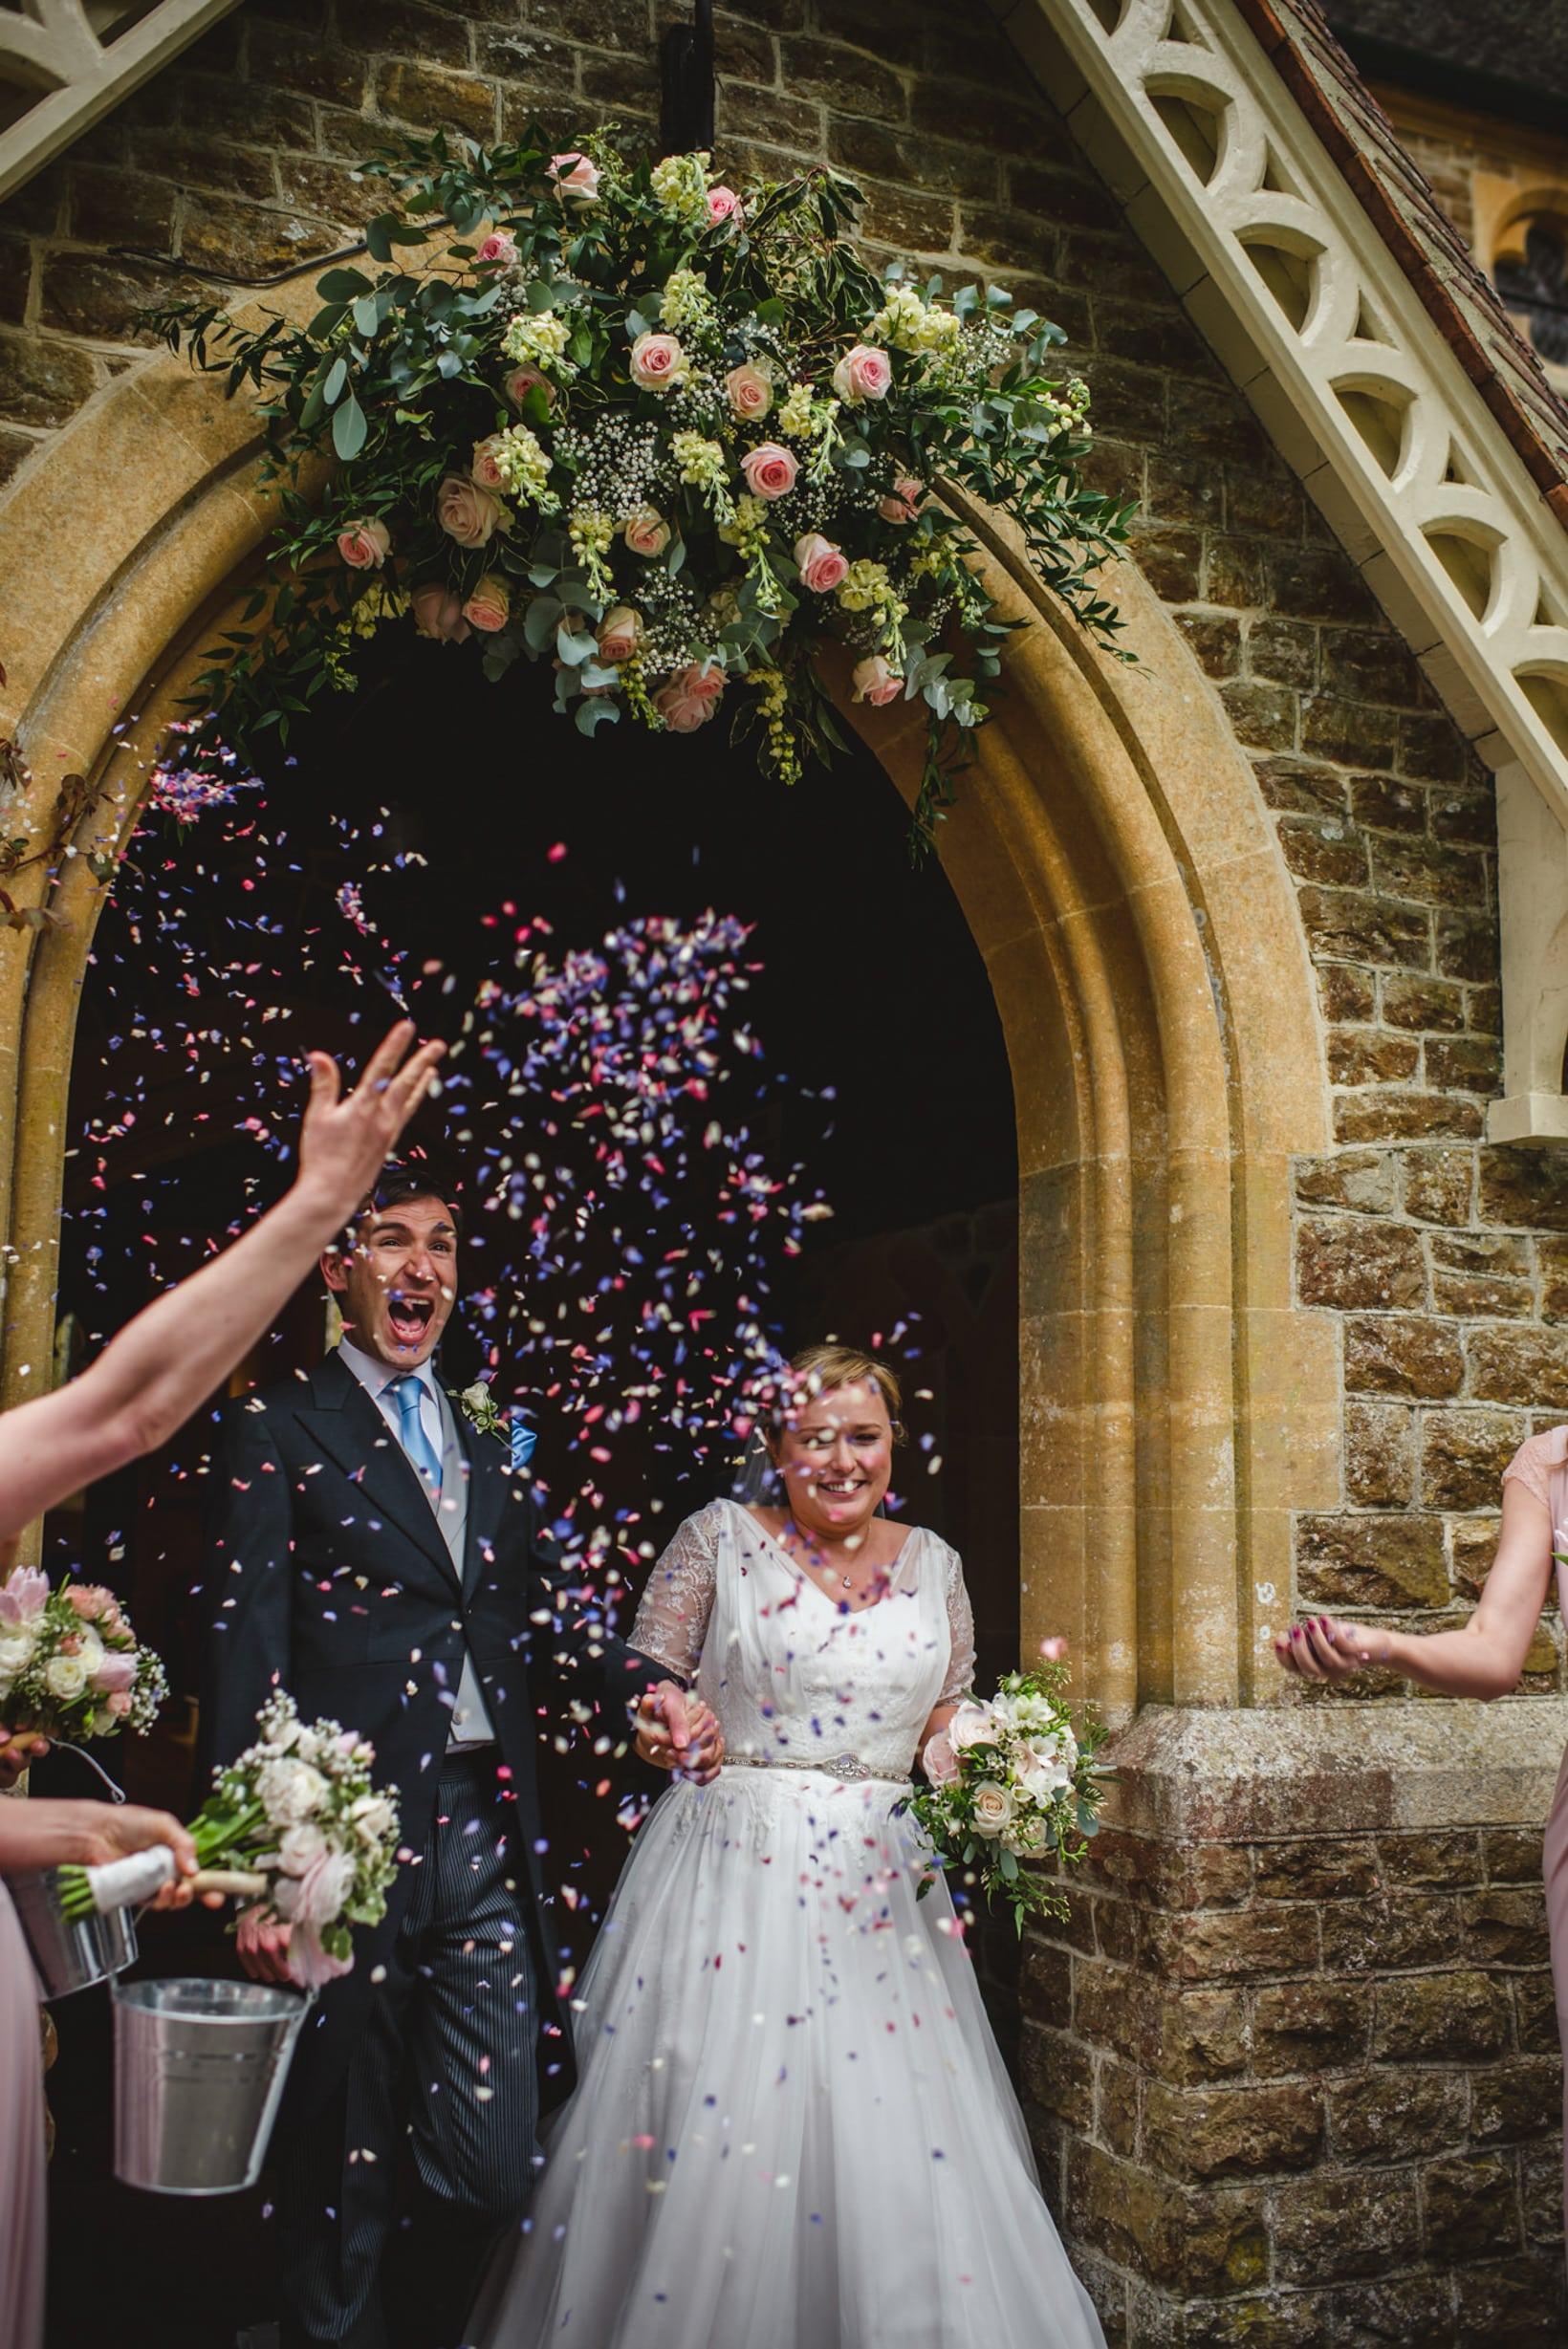 Jo Olly Liphook Hampshire Wedding Photography